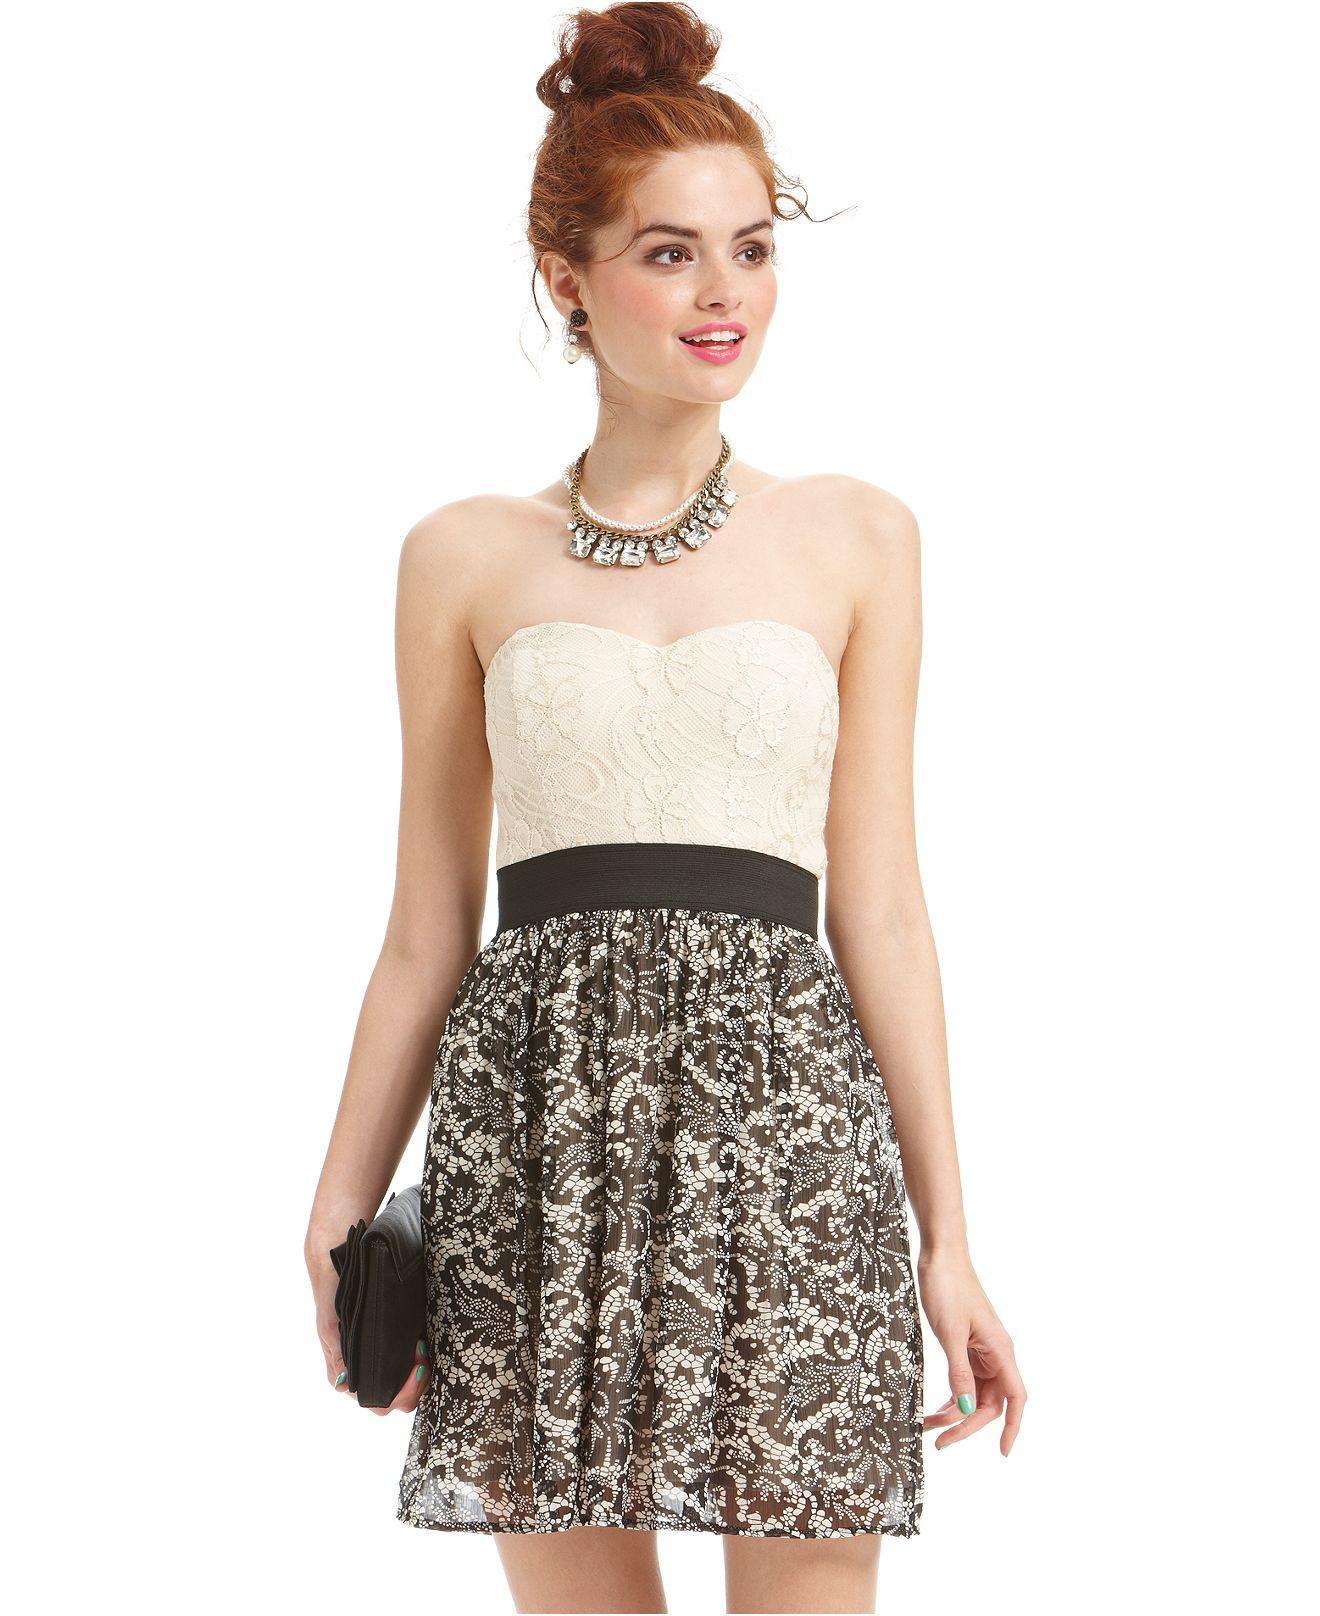 098a9961421af Trixxi Juniors Dress, Strapless Sweetheart Lace - Juniors Dresses - Macy's  Dance Dresses, Cute